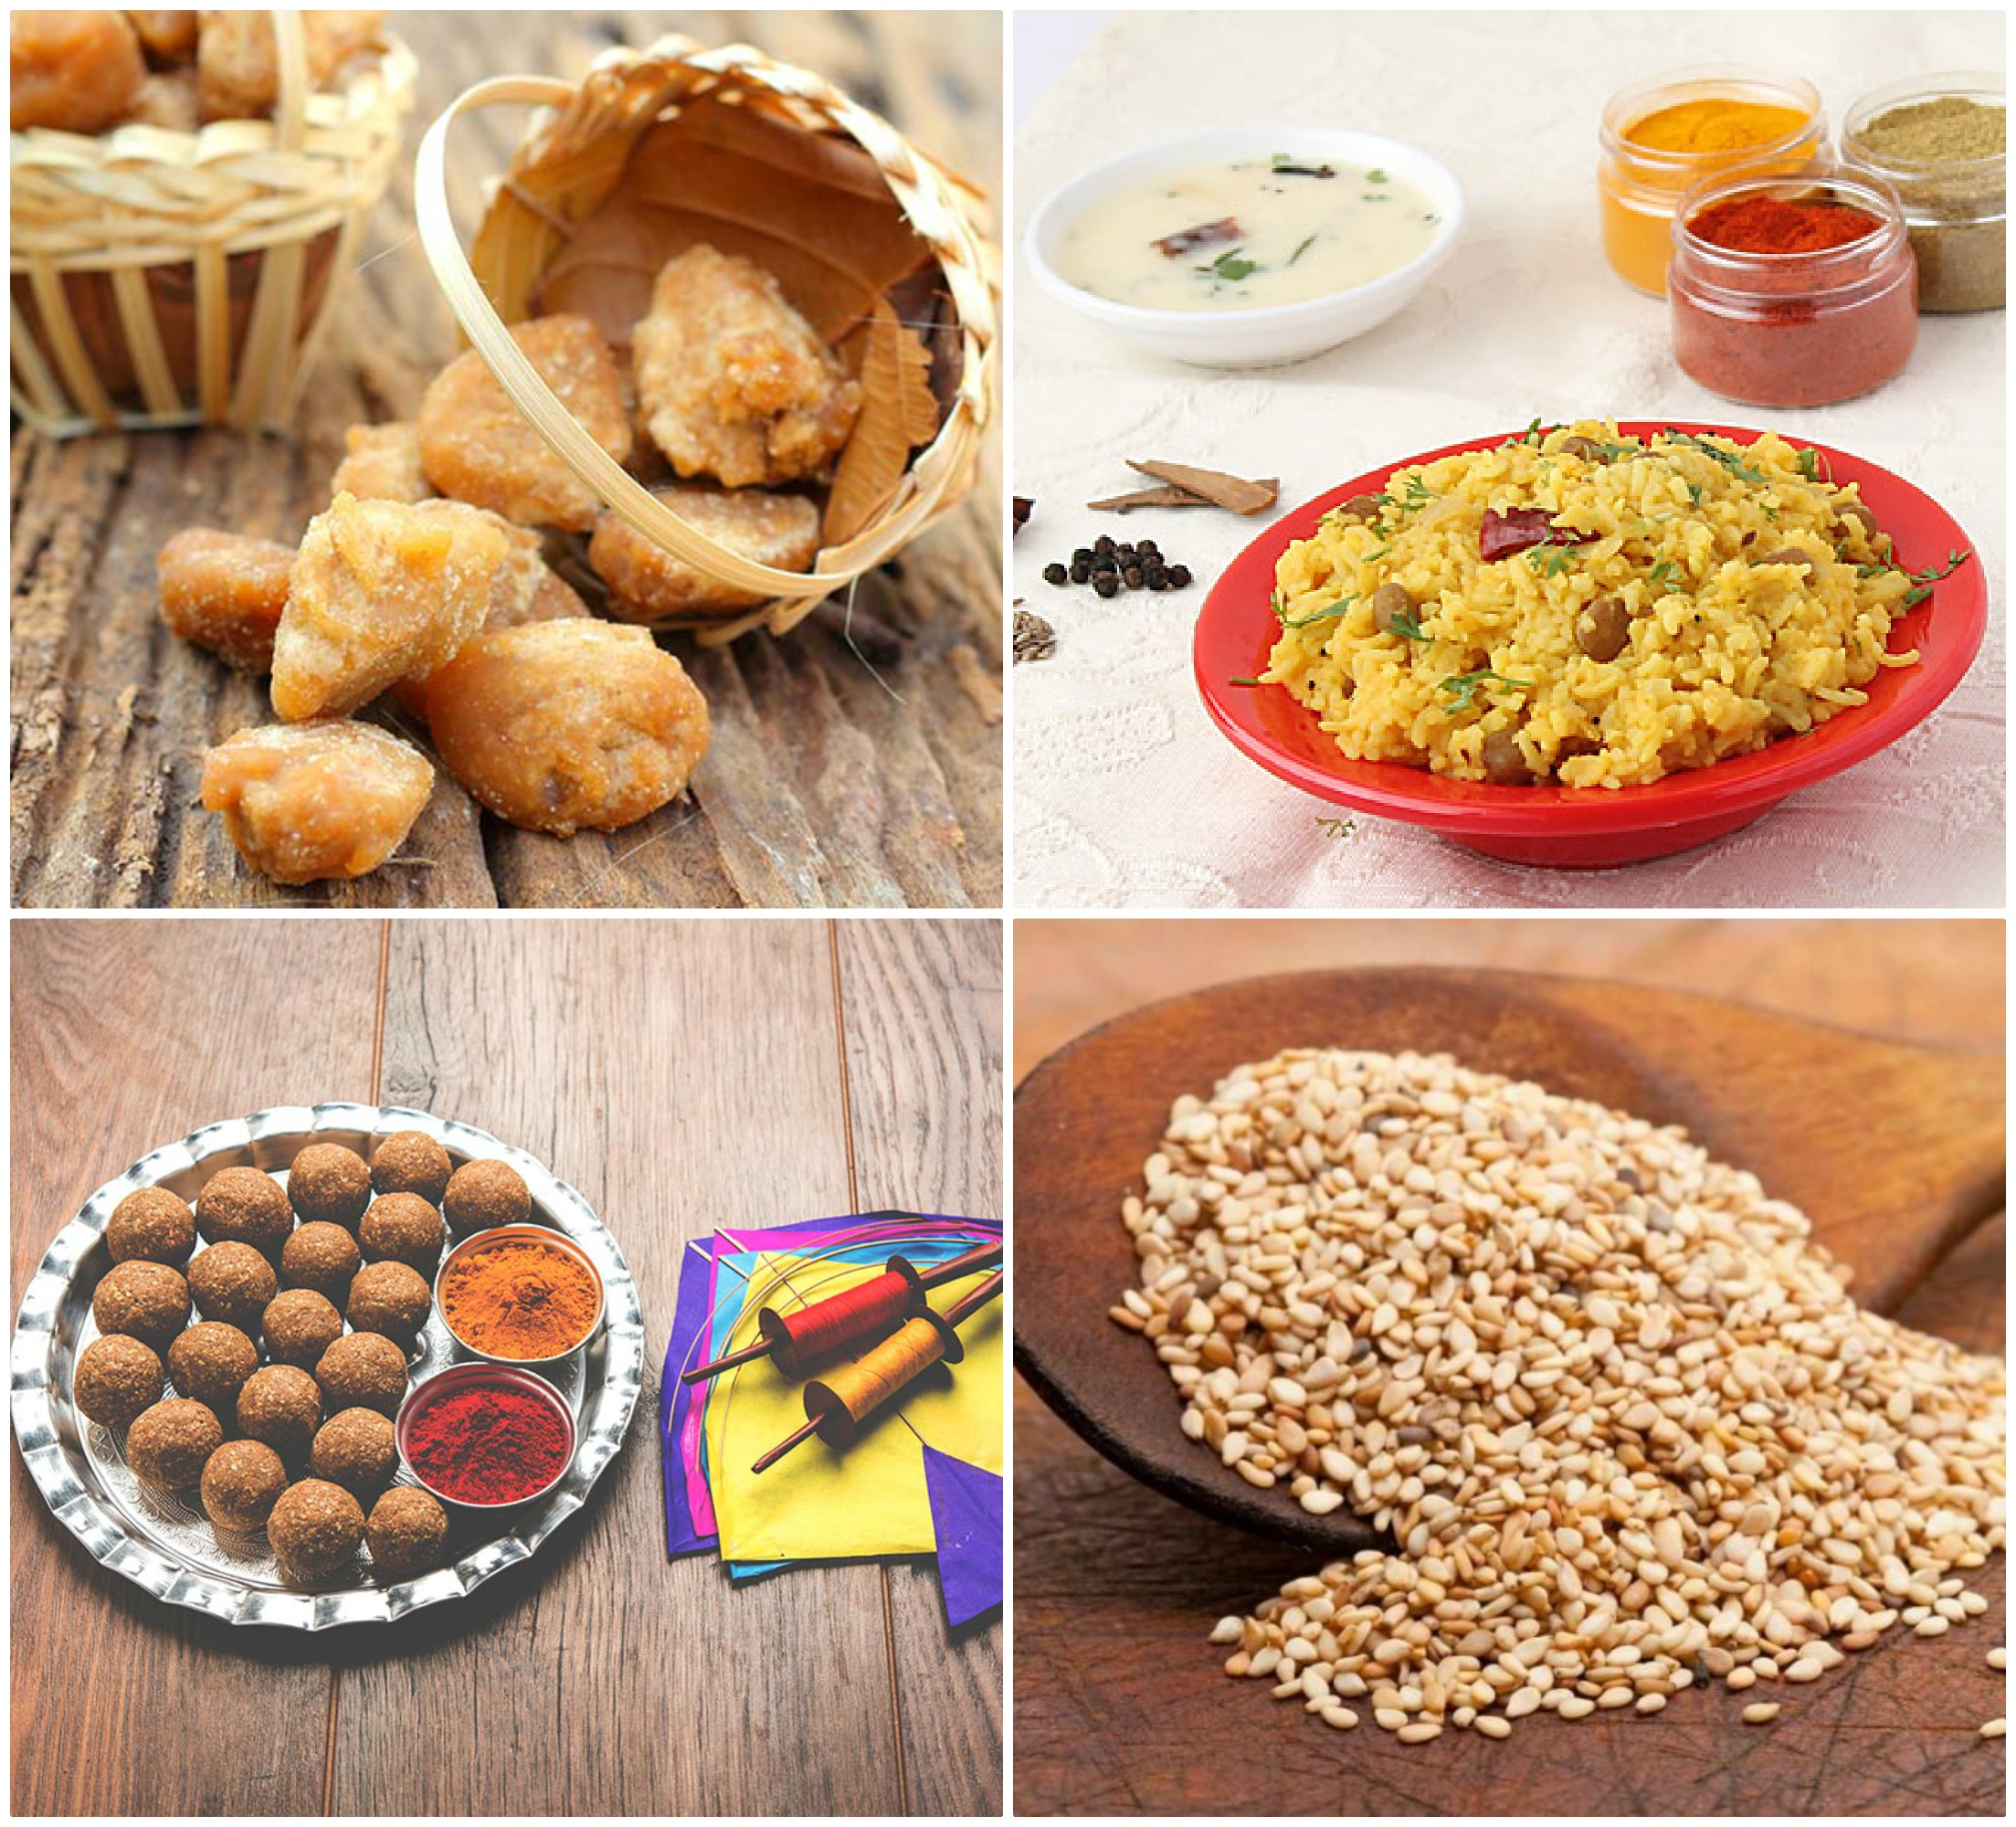 PunjabKesari, Makar Sankranti food Image, Healthy Life Image